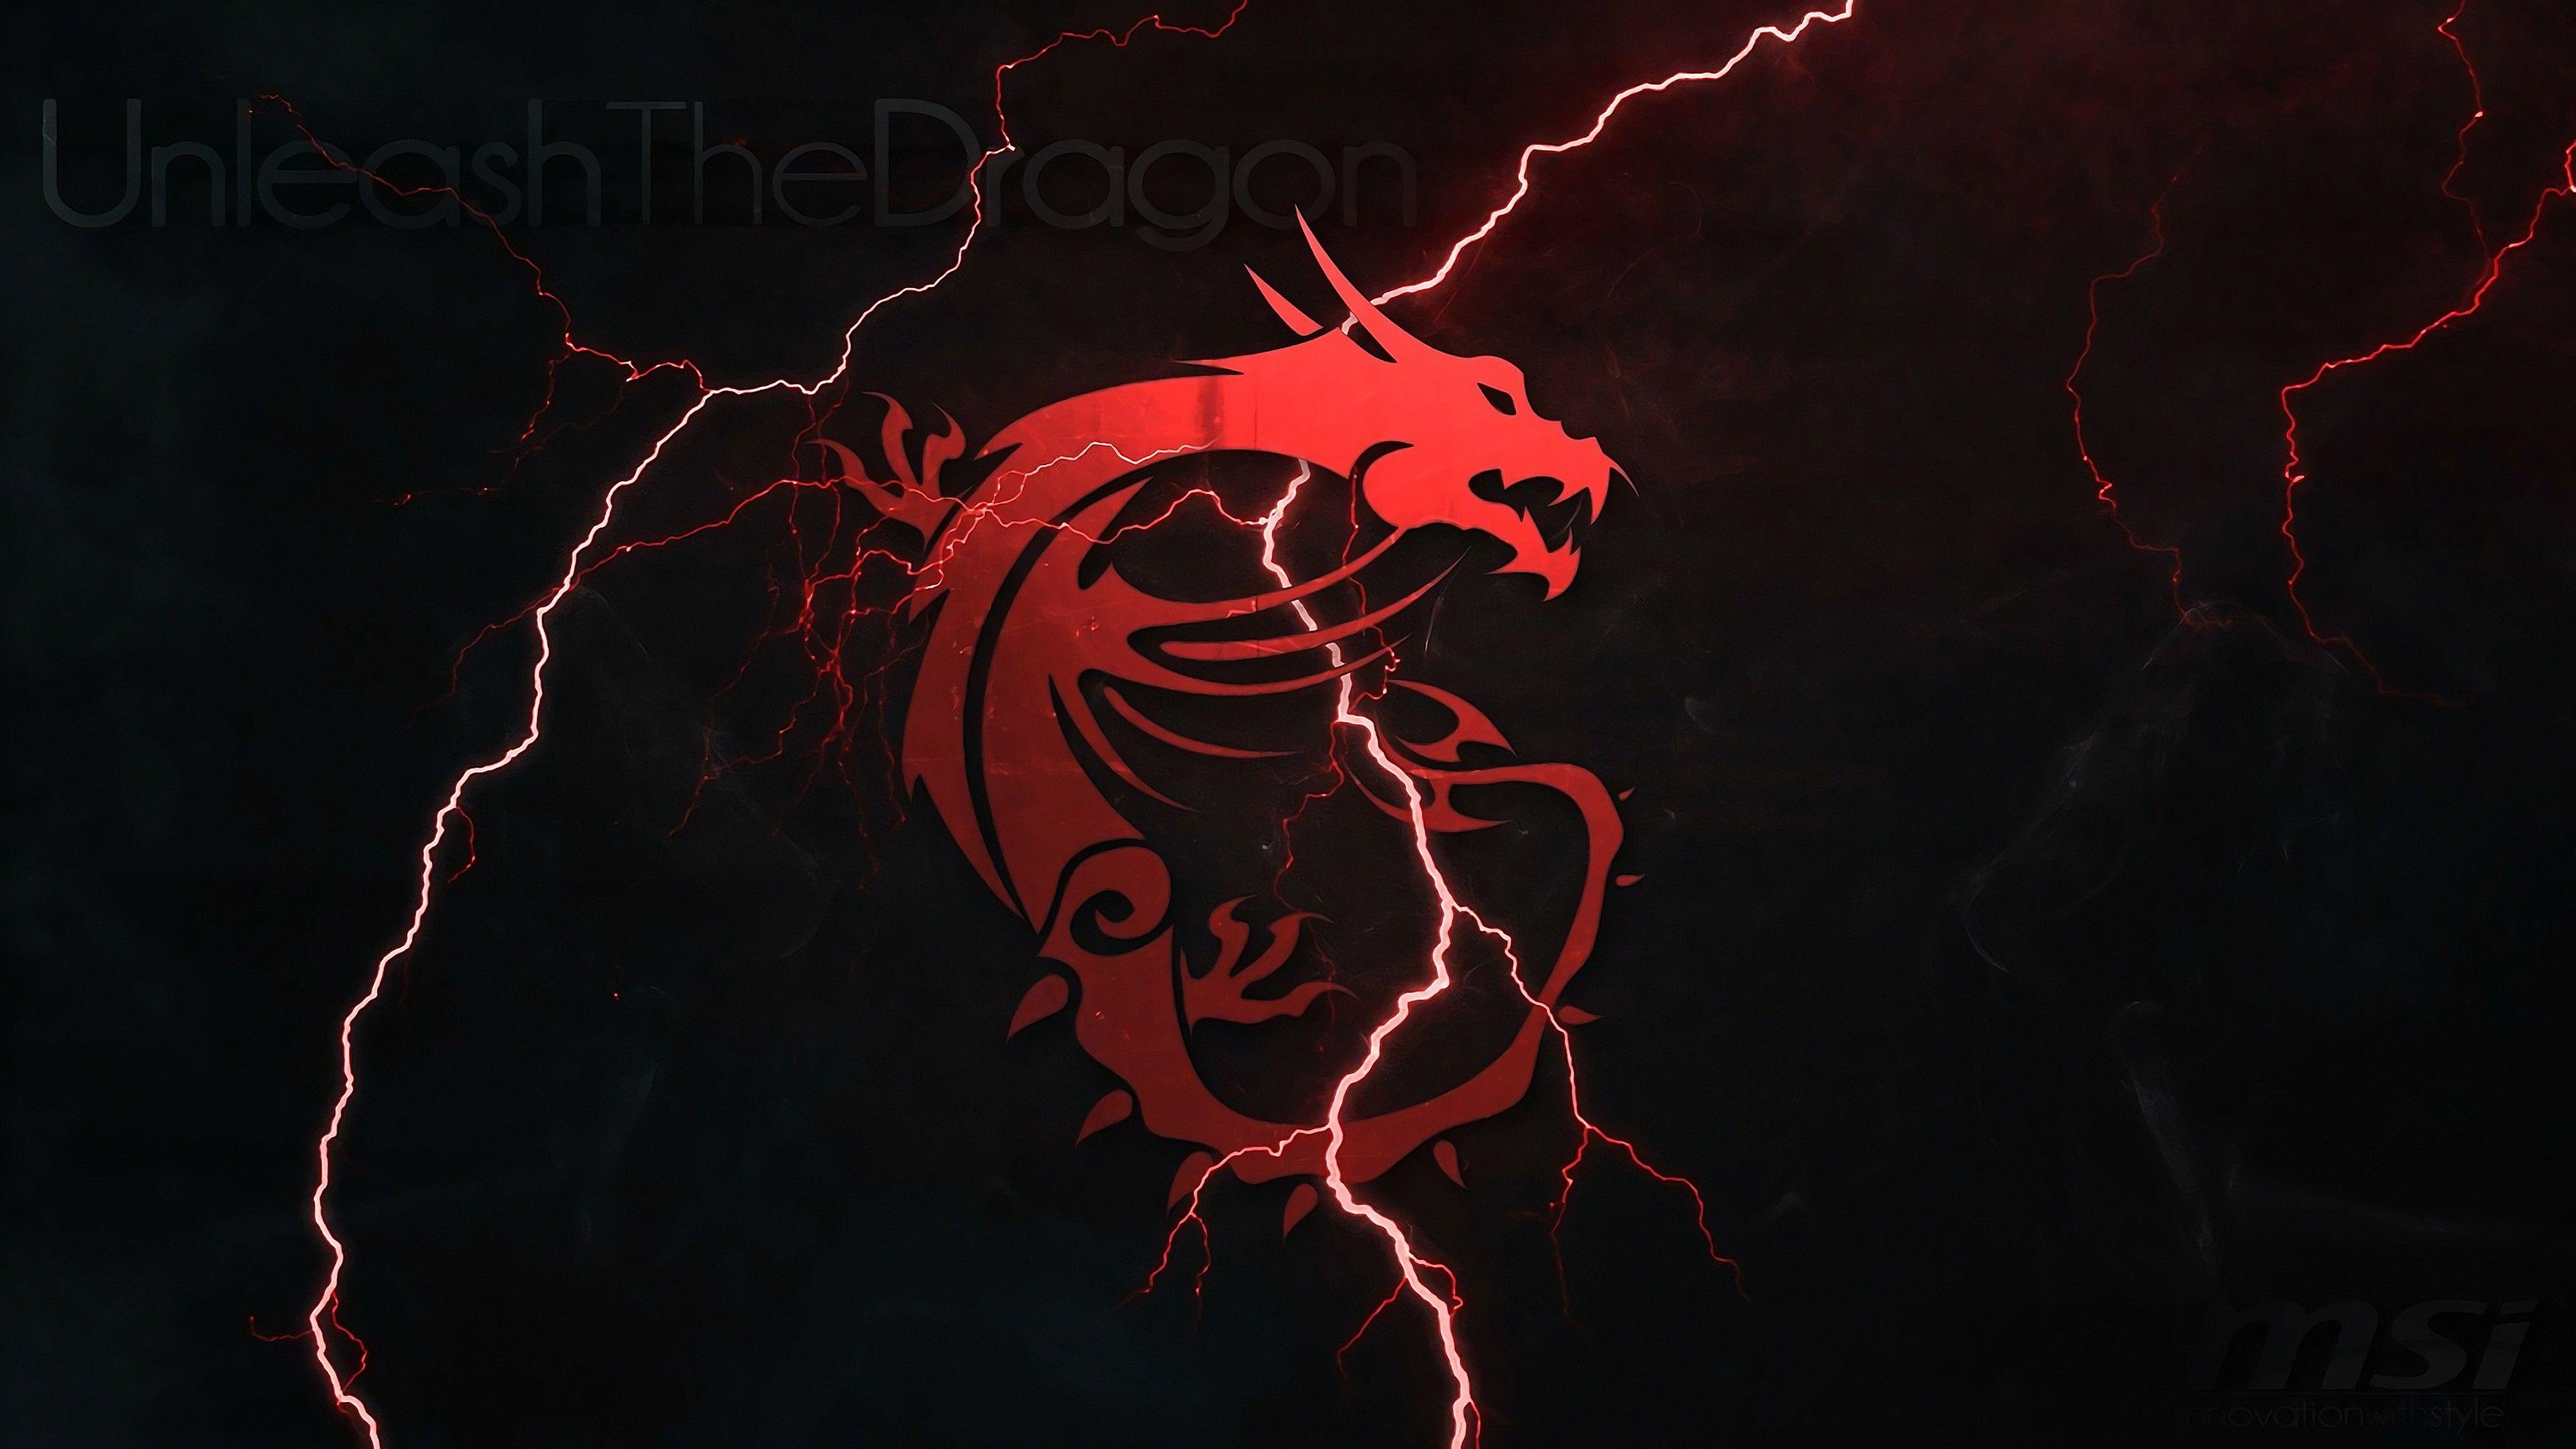 3840x2160 Msi Dragon Logo Lightning 4k Wallpaper Gaming Wallpapers Dark Wallpaper 3840x2160 Wallpaper